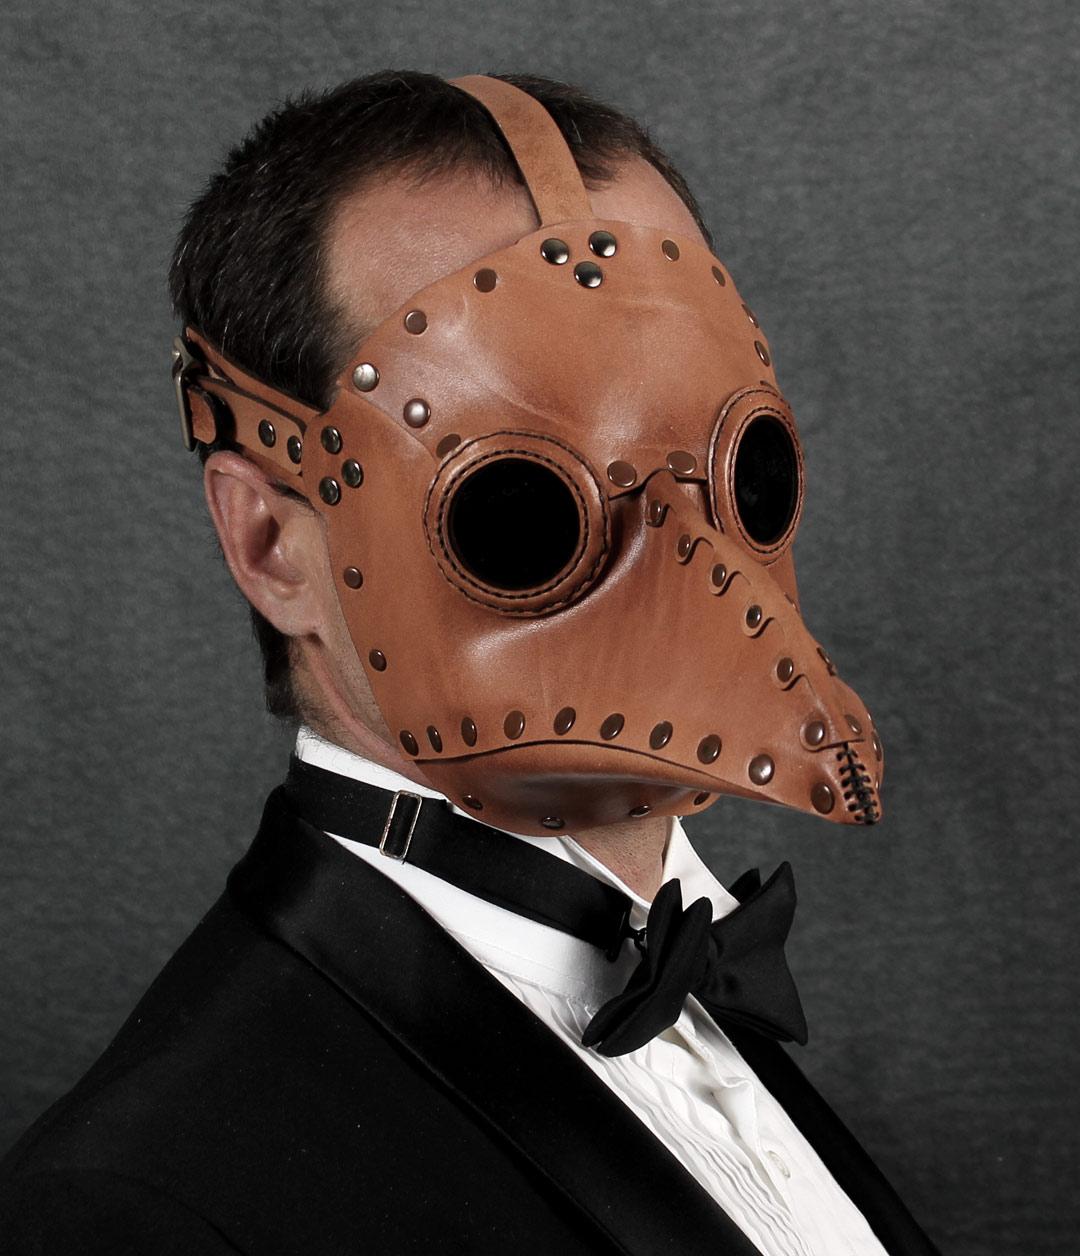 krankheit-lt-brown-Jason-front-angle.jpg